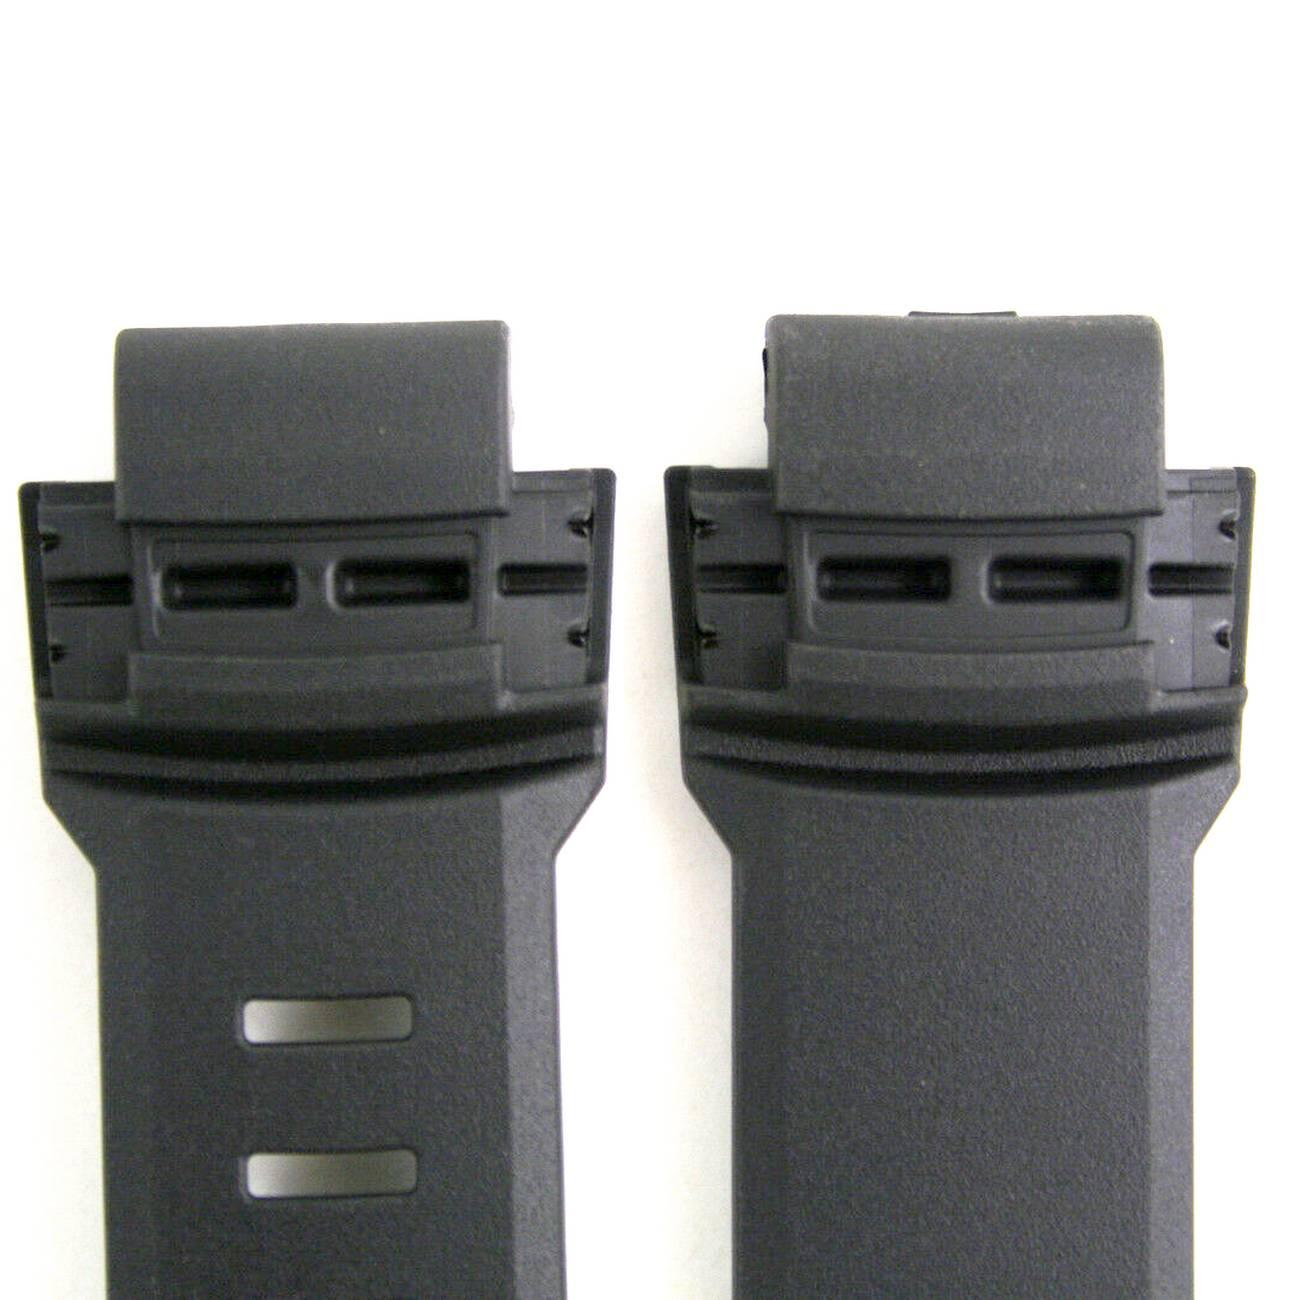 Pulseira Casio PathFinder PAW-5000 Resina Preta (18/27mm)  - E-Presentes